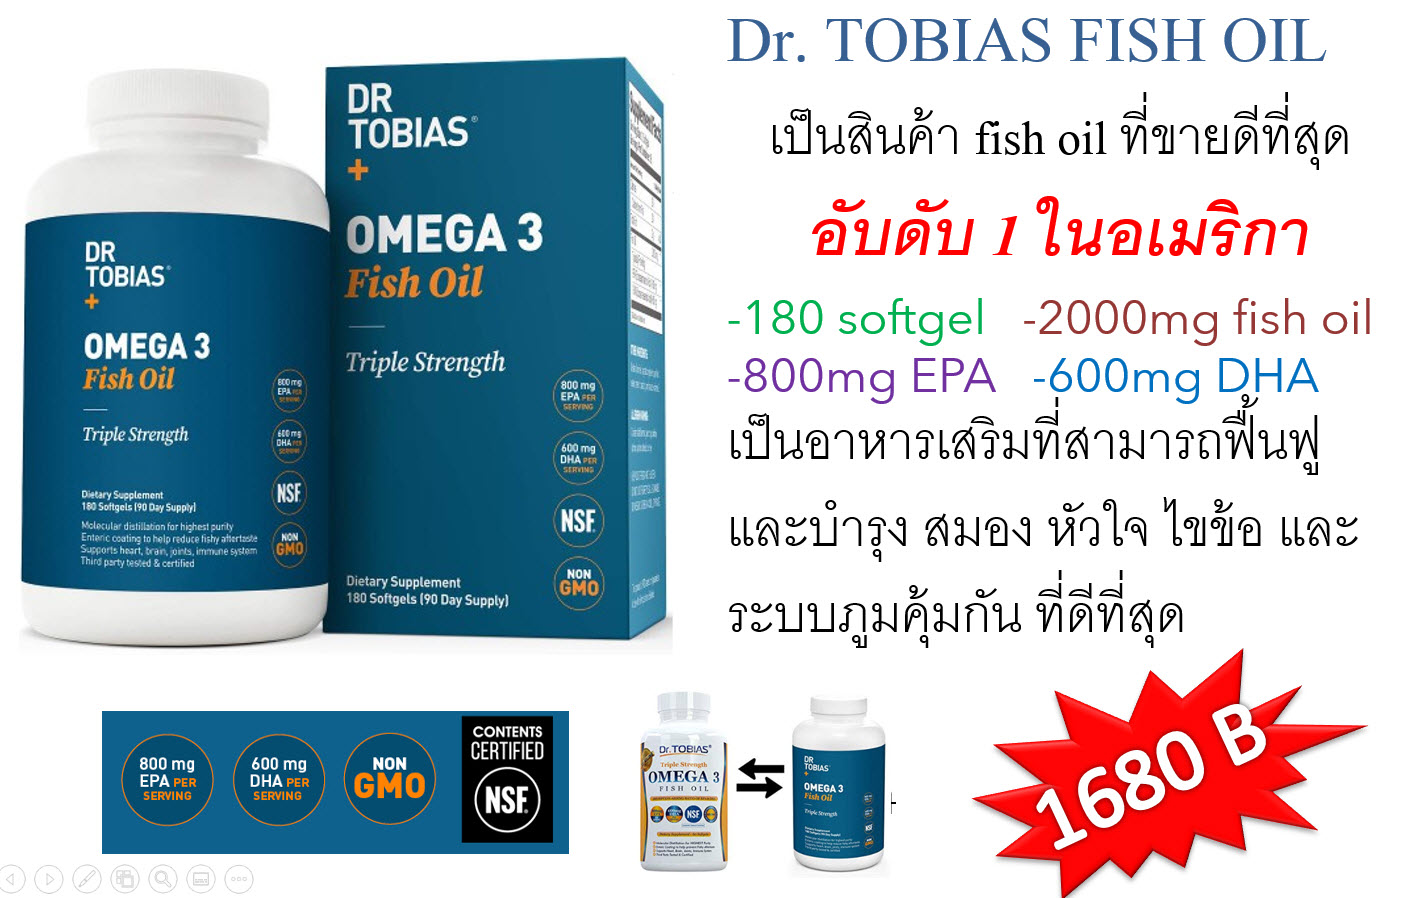 Dr. TOBIAS FISH OIL ยี่ห้อไหนดี ราคา